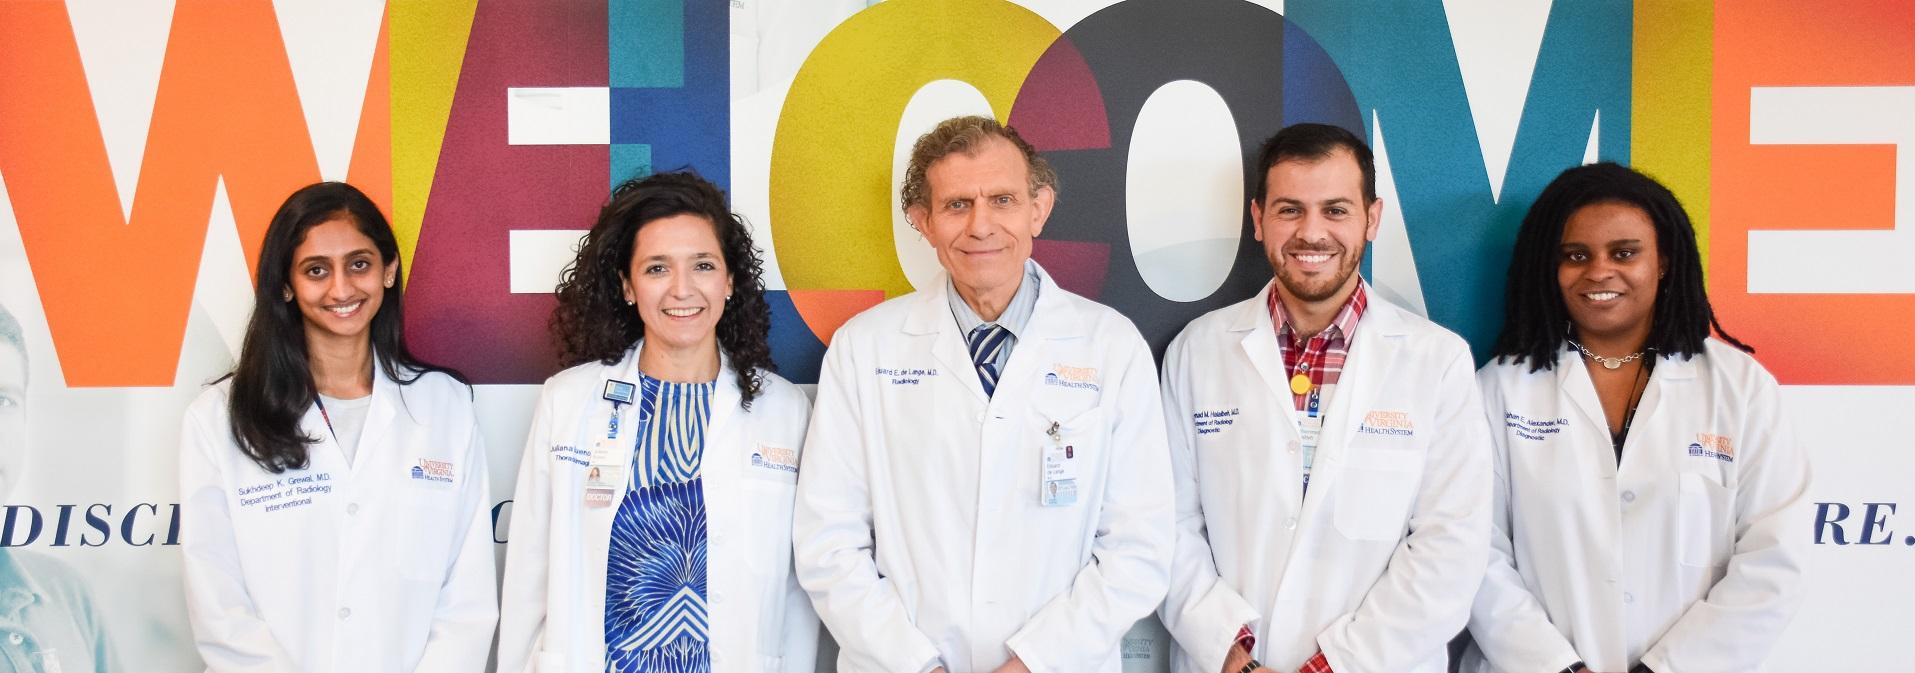 Radiology and Medical Imaging | University of Virginia